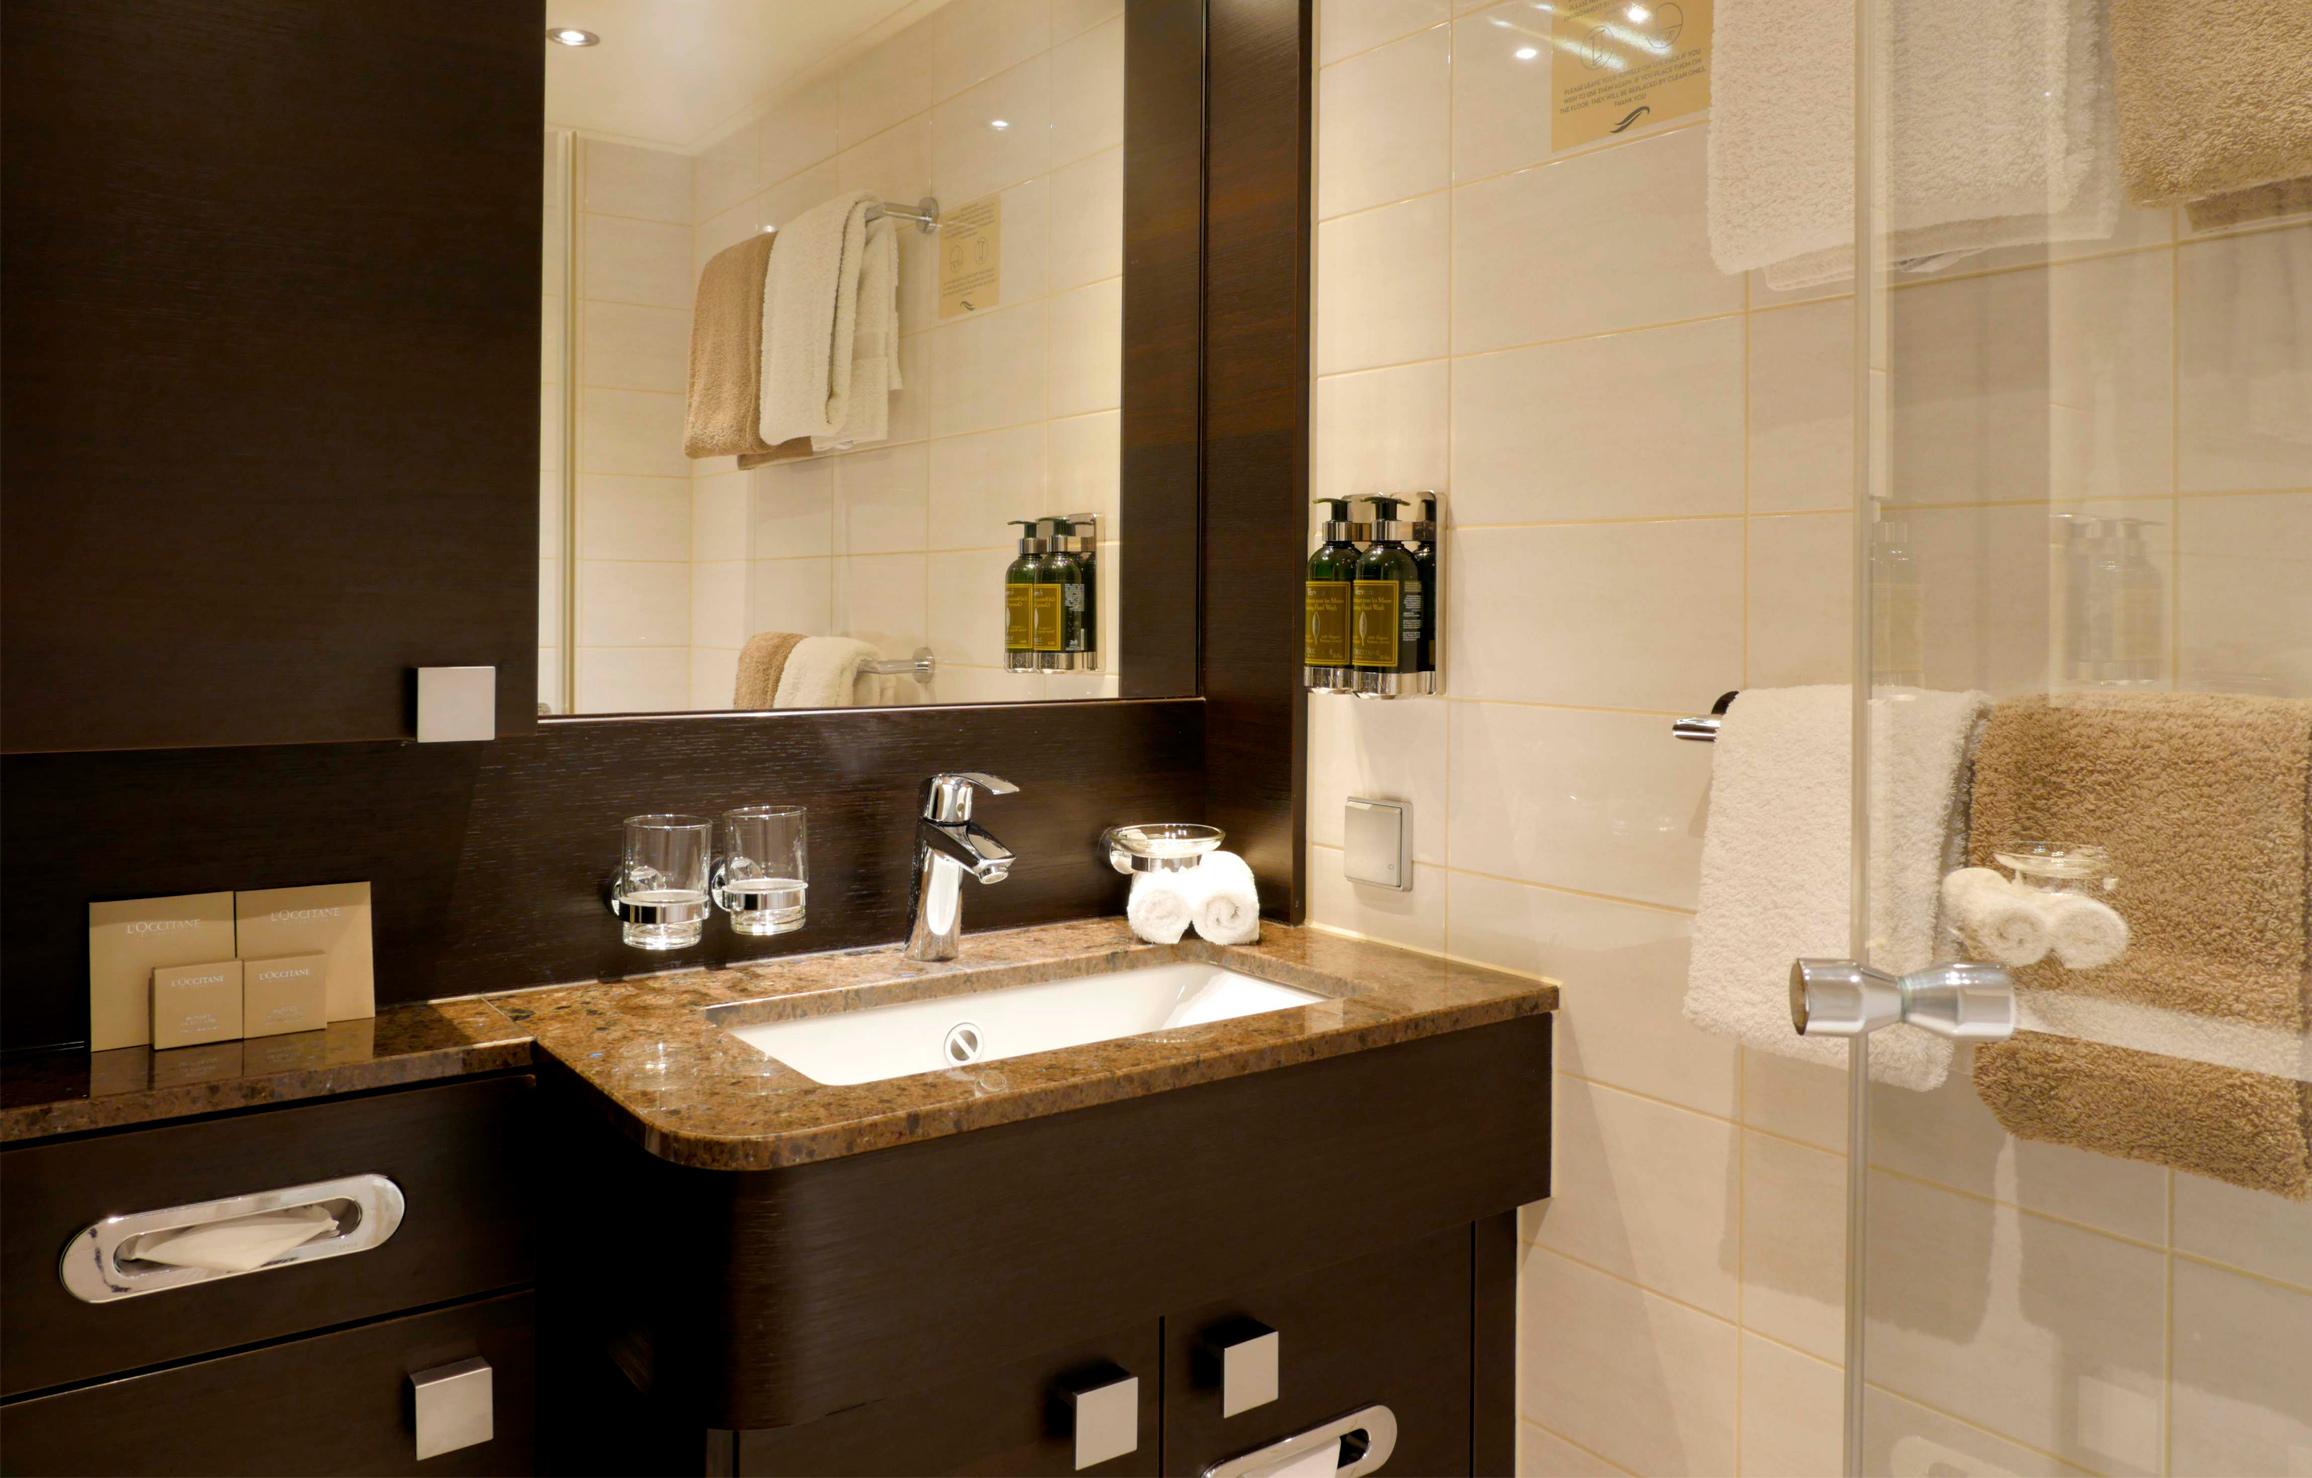 Deluxe Stateroom Bathroom